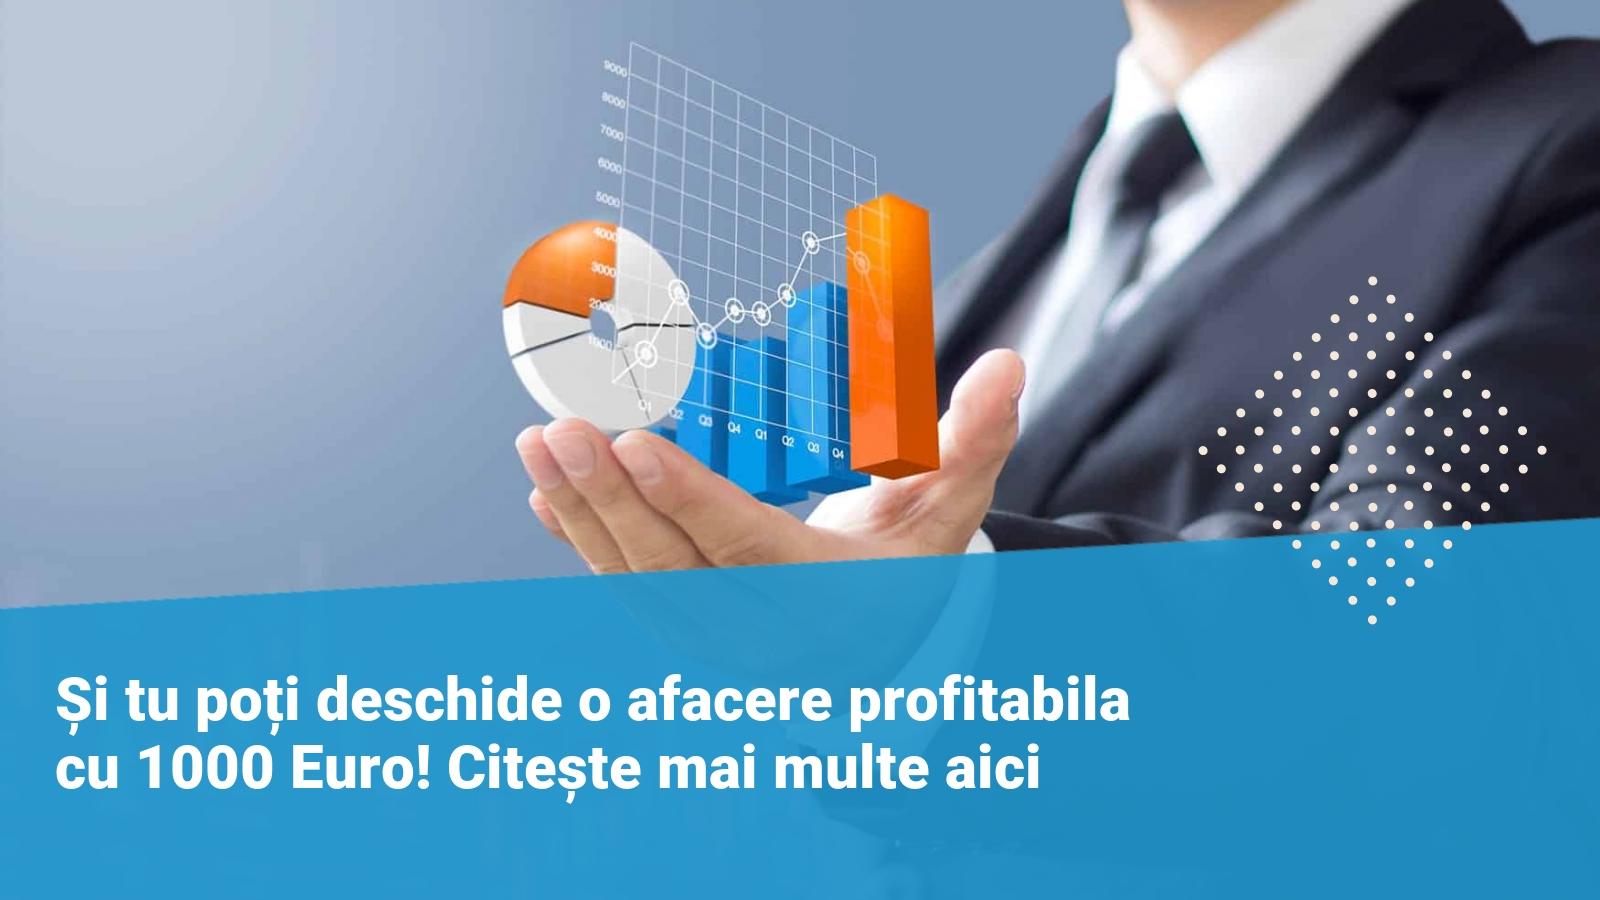 afacere profitabila cu 1000 euro